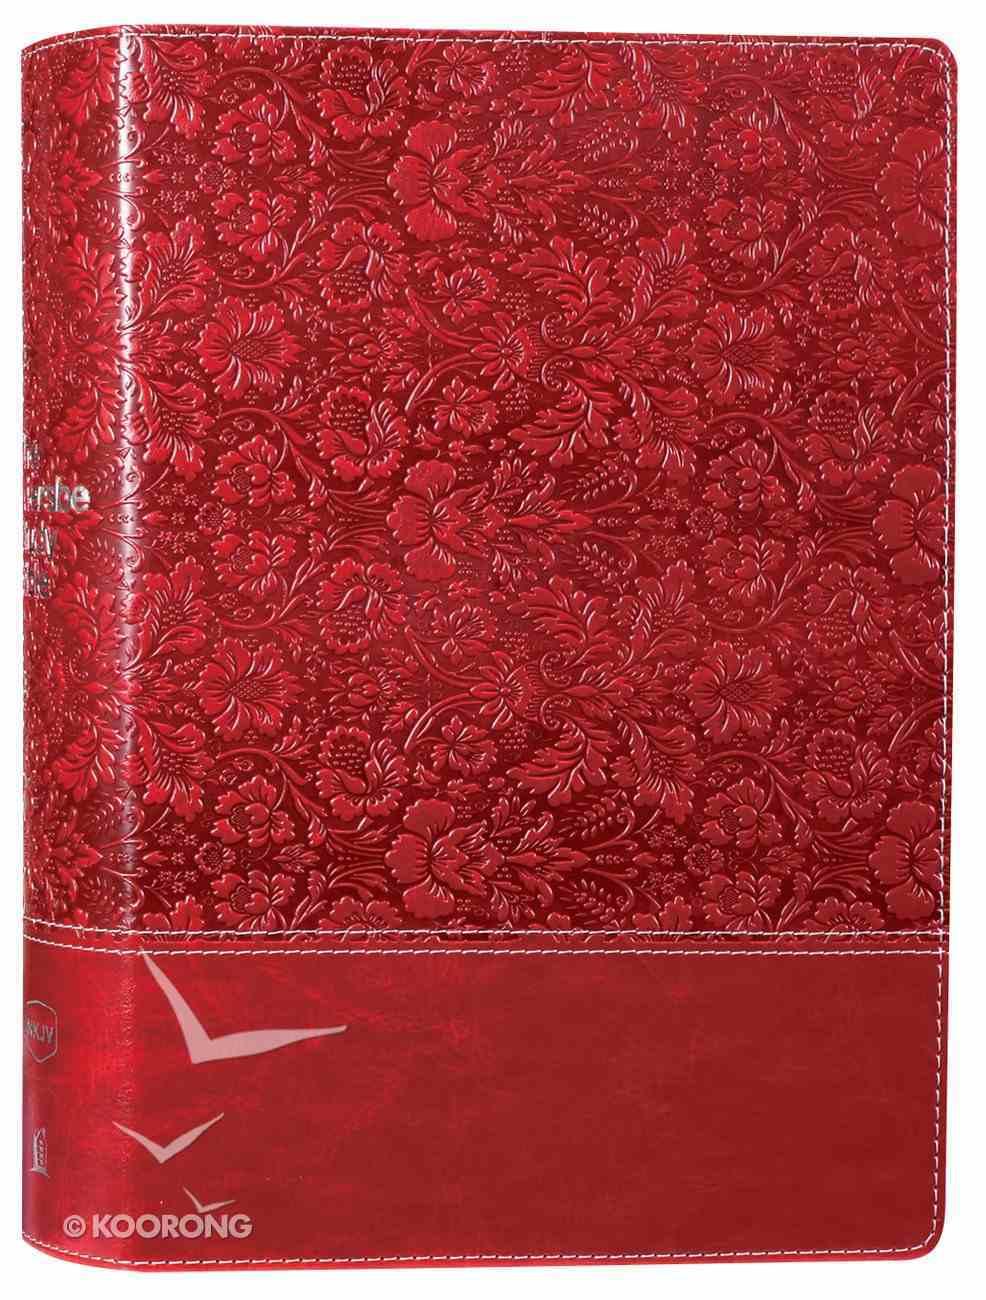 NKJV Wiersbe Study Bible Burgundy Premium Imitation Leather